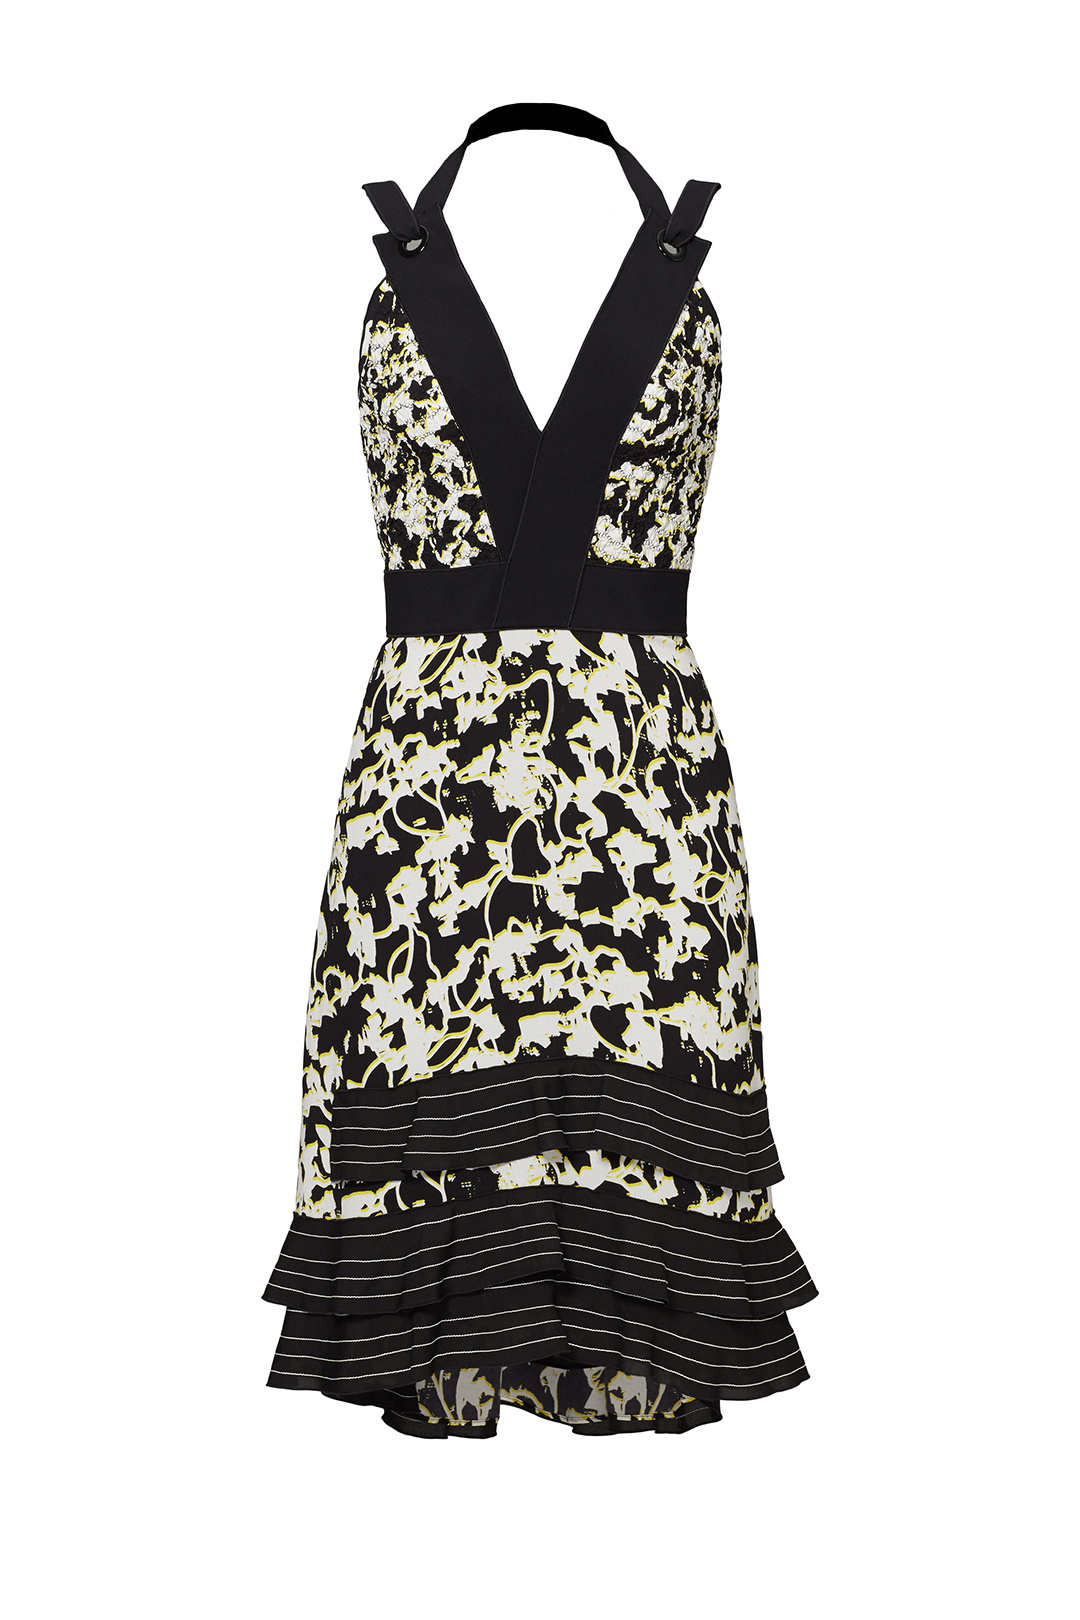 Copy of Yellow Vine Dress